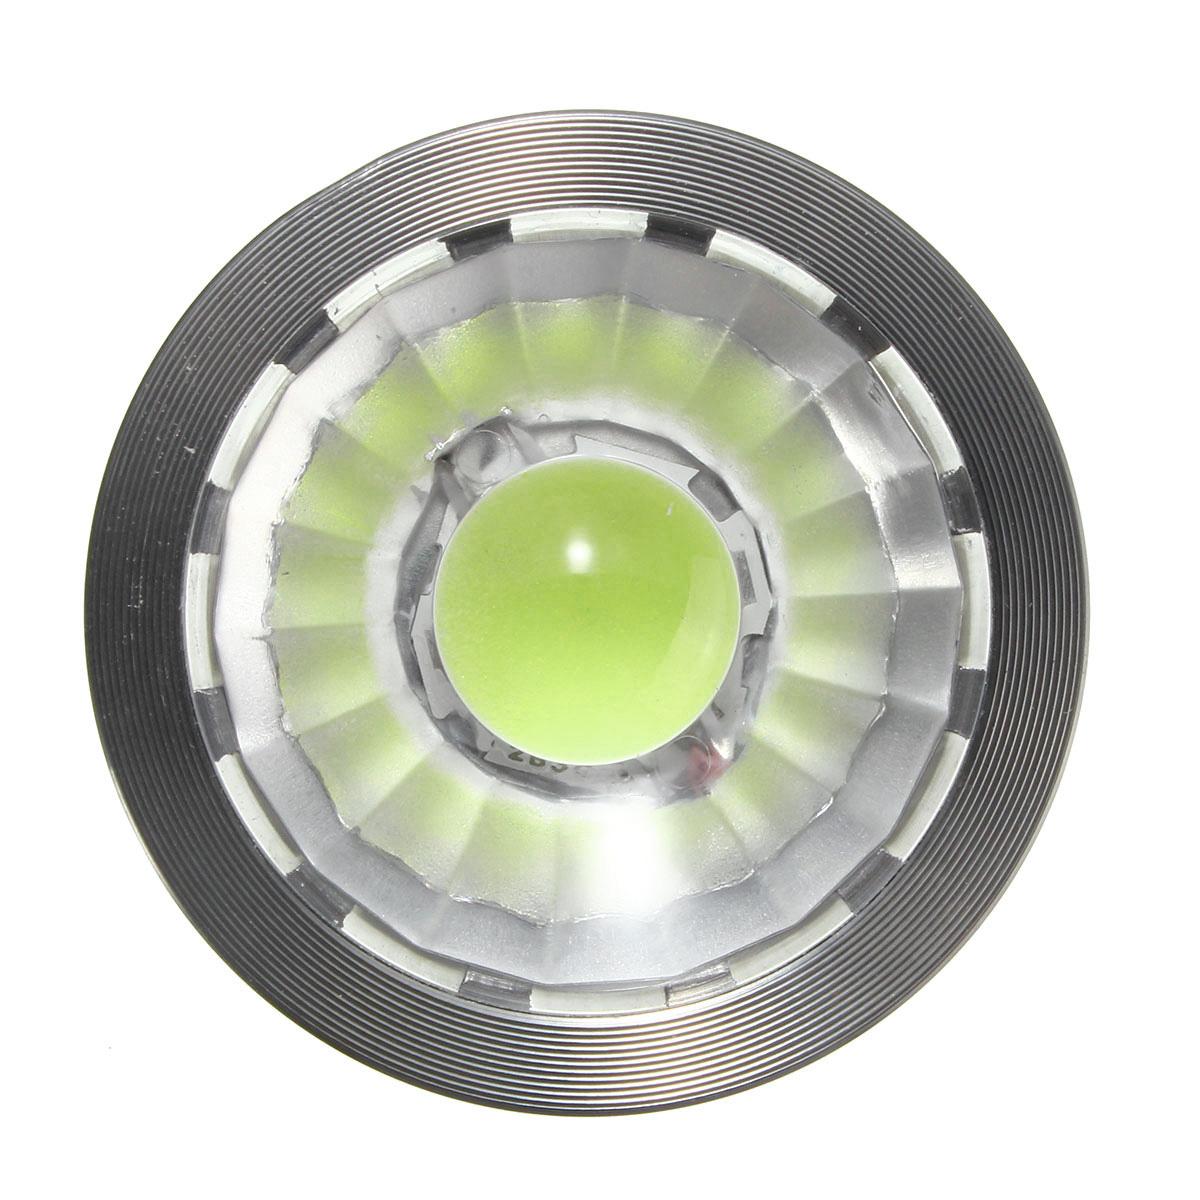 led ultra bright dimmable 7w 600lm gu10 cob led spot light. Black Bedroom Furniture Sets. Home Design Ideas